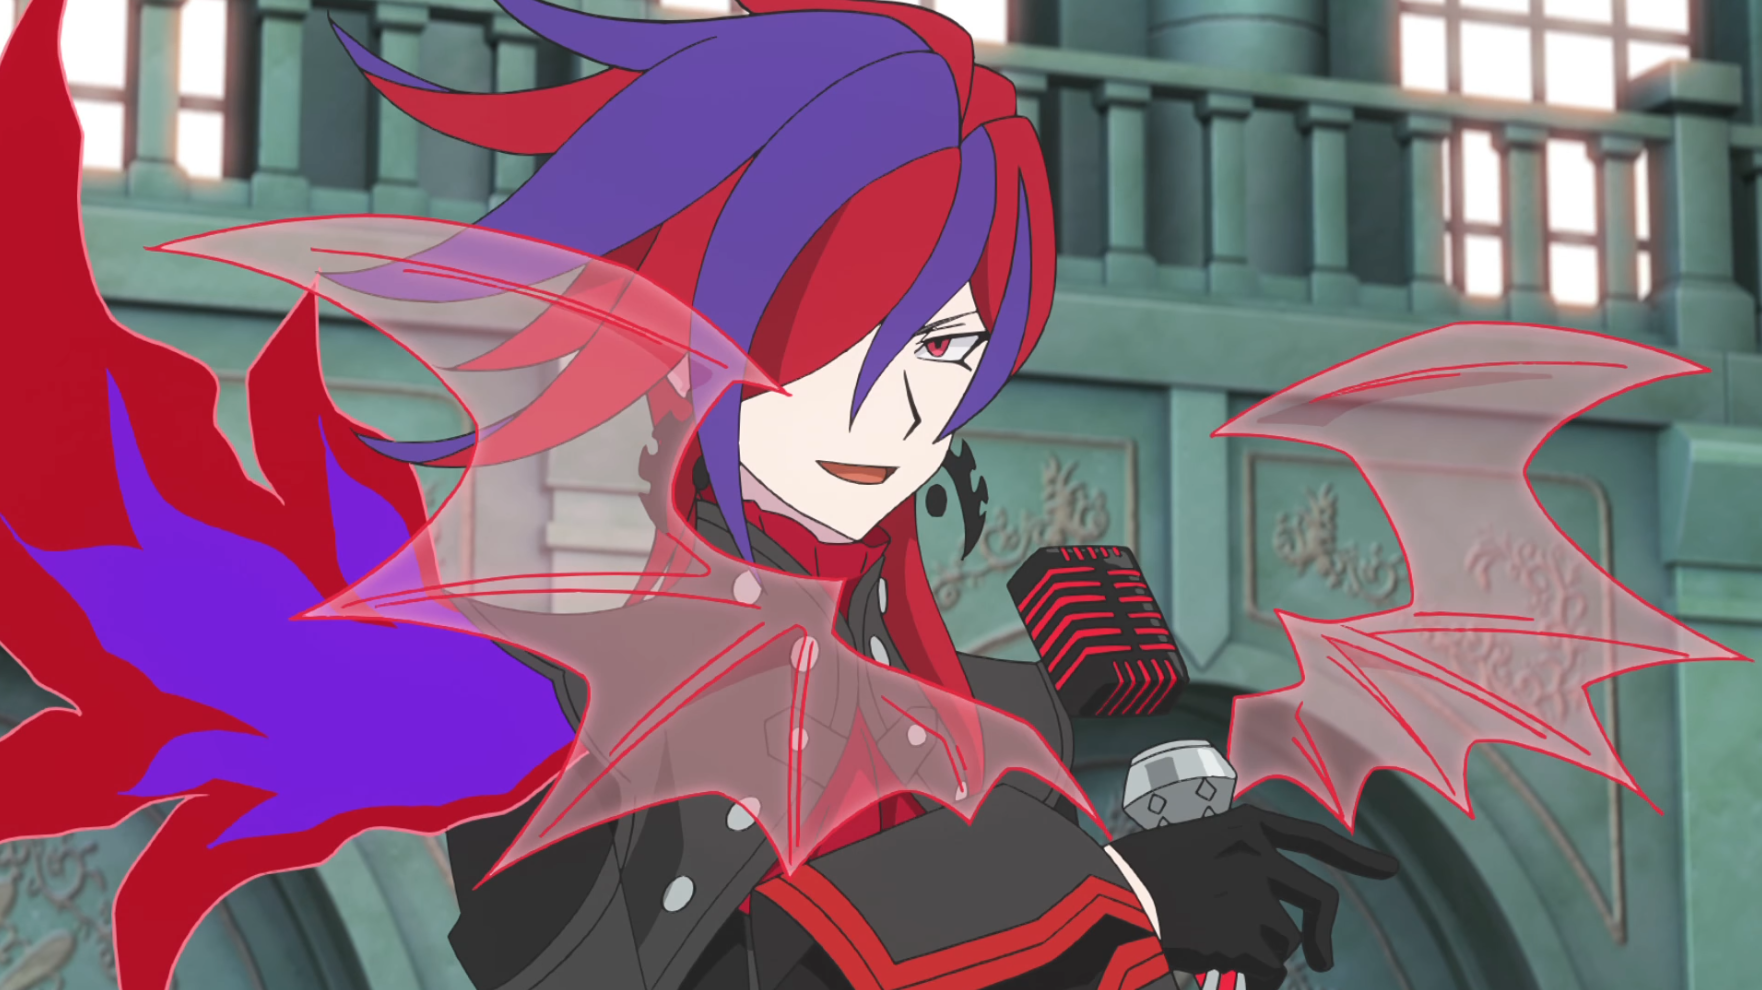 Magic Singer, Sync (character)